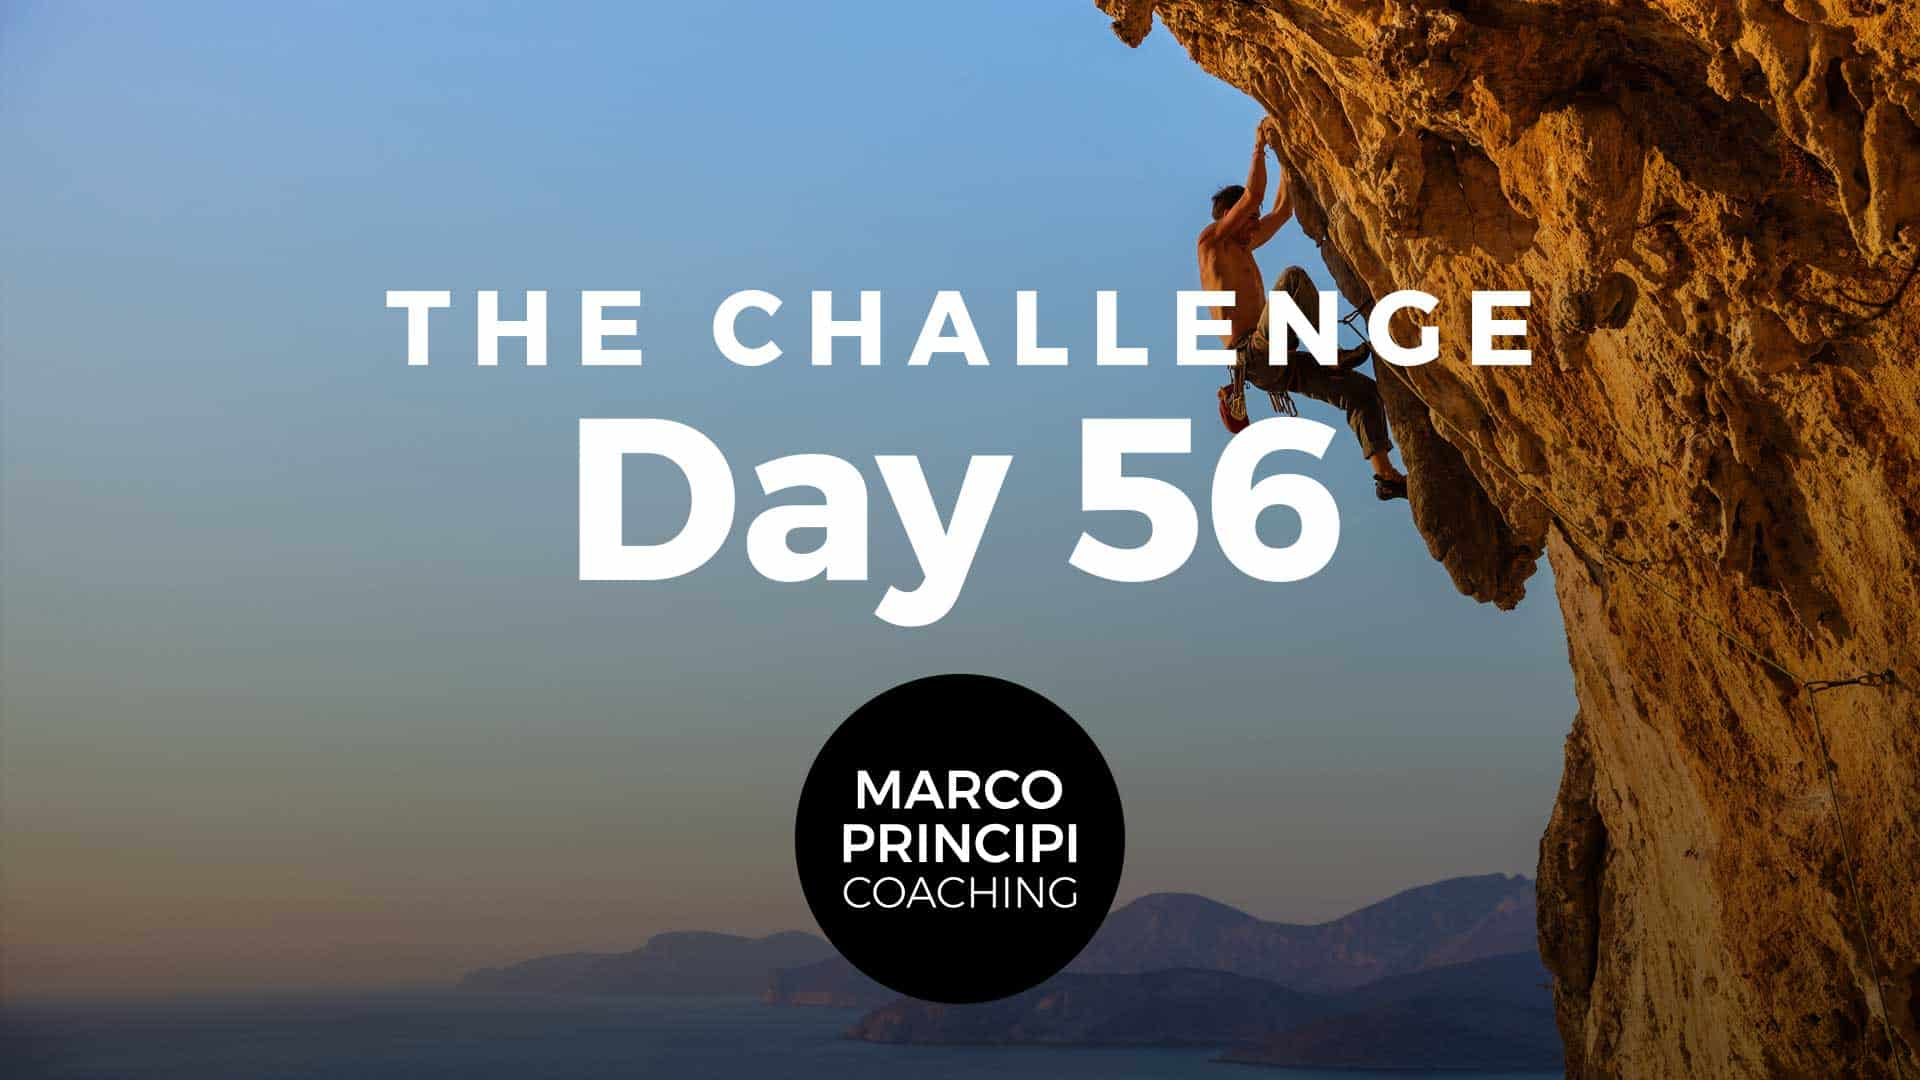 Marco Principi The Challenge Day 56